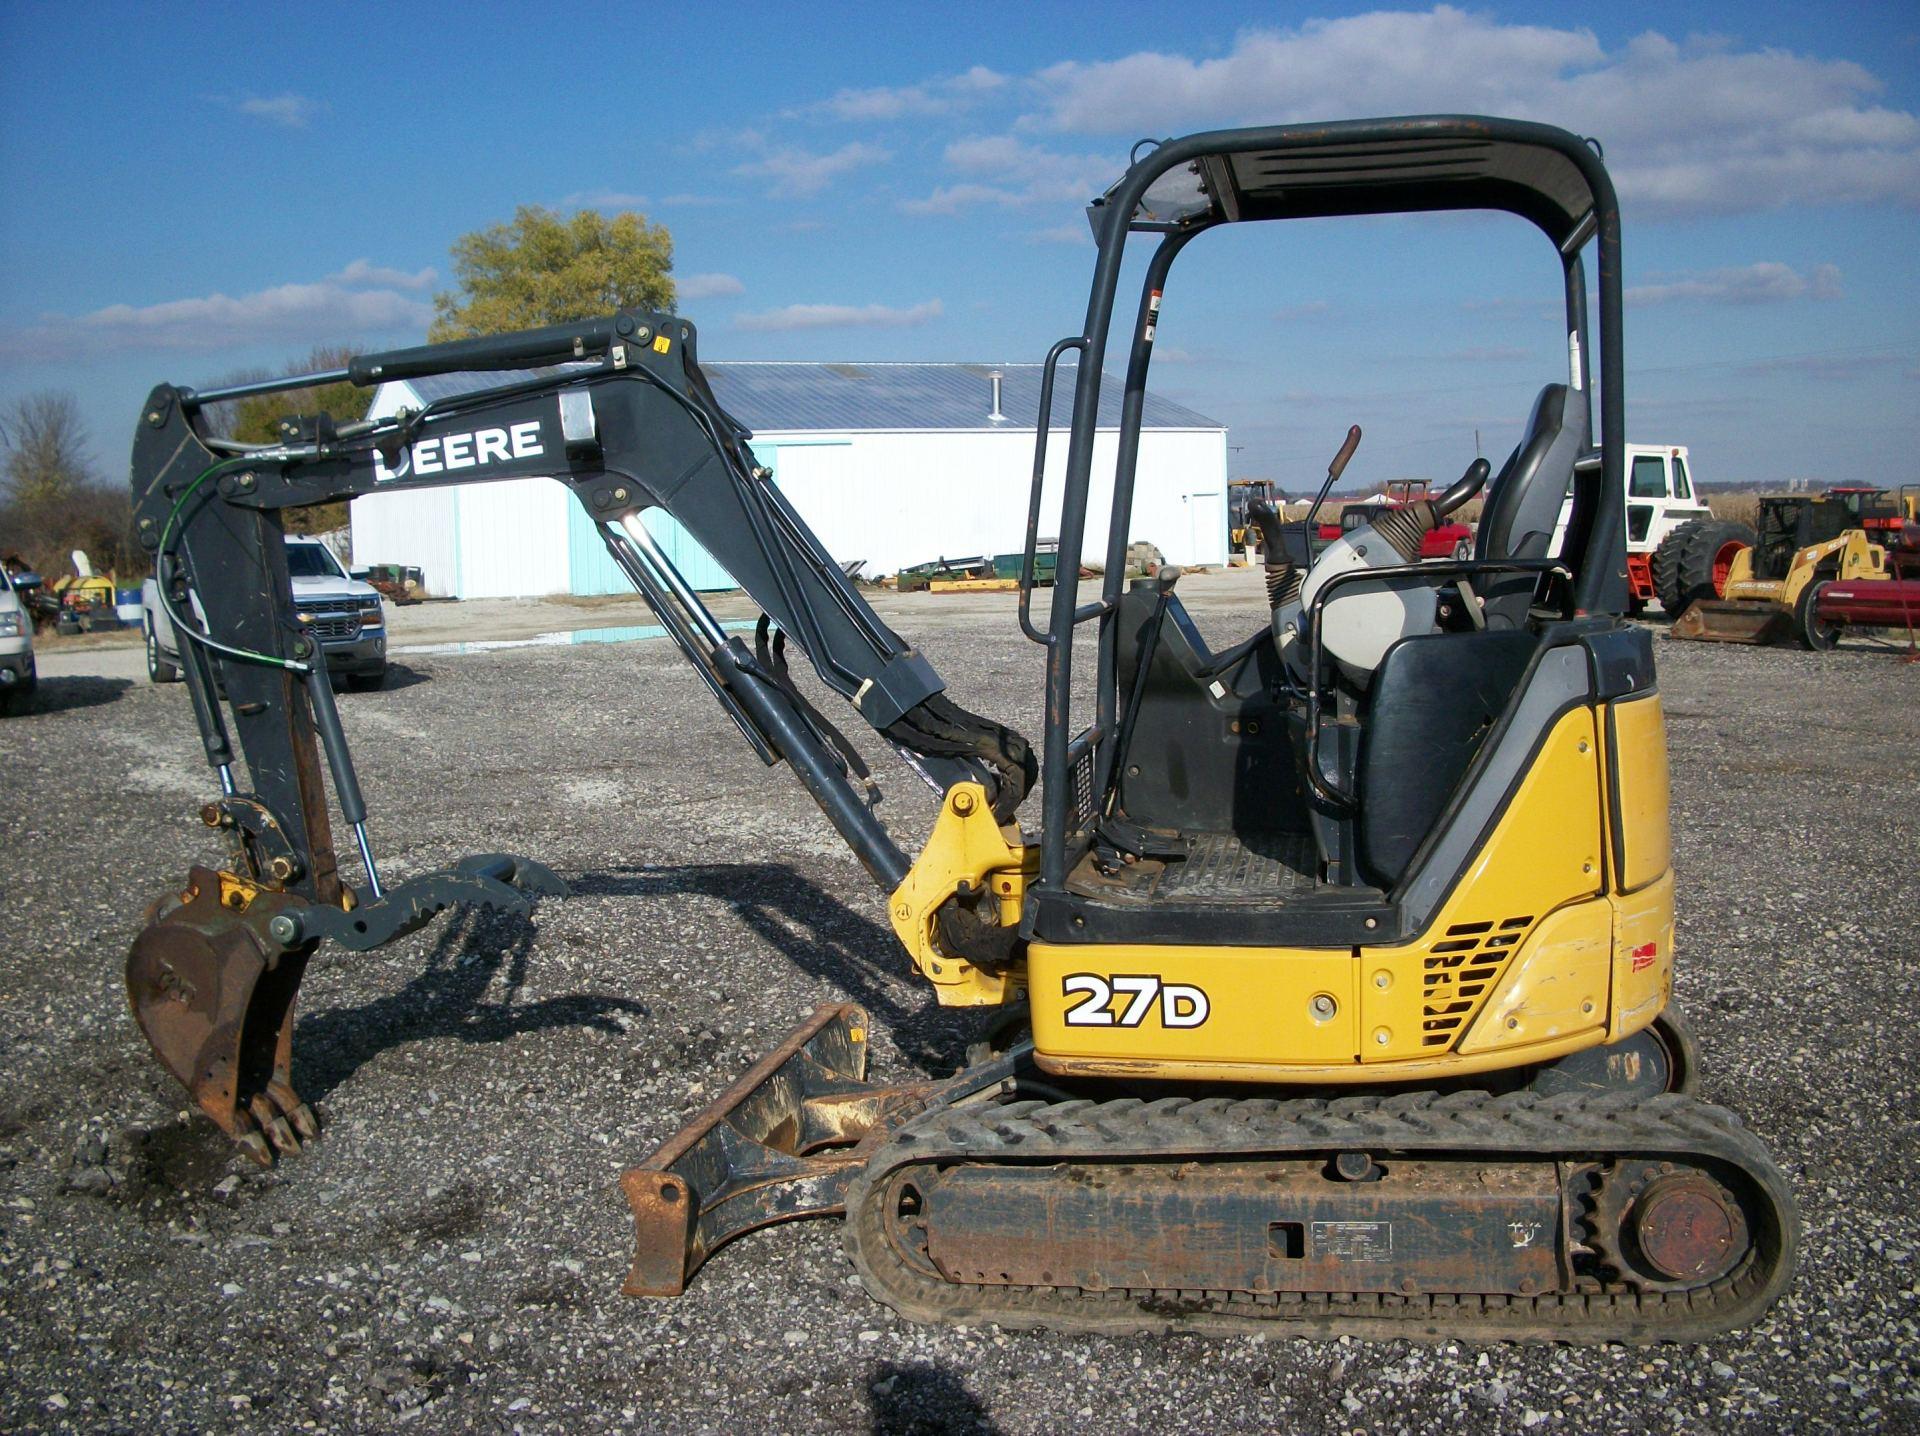 2013 John Deere 27D     $23,500